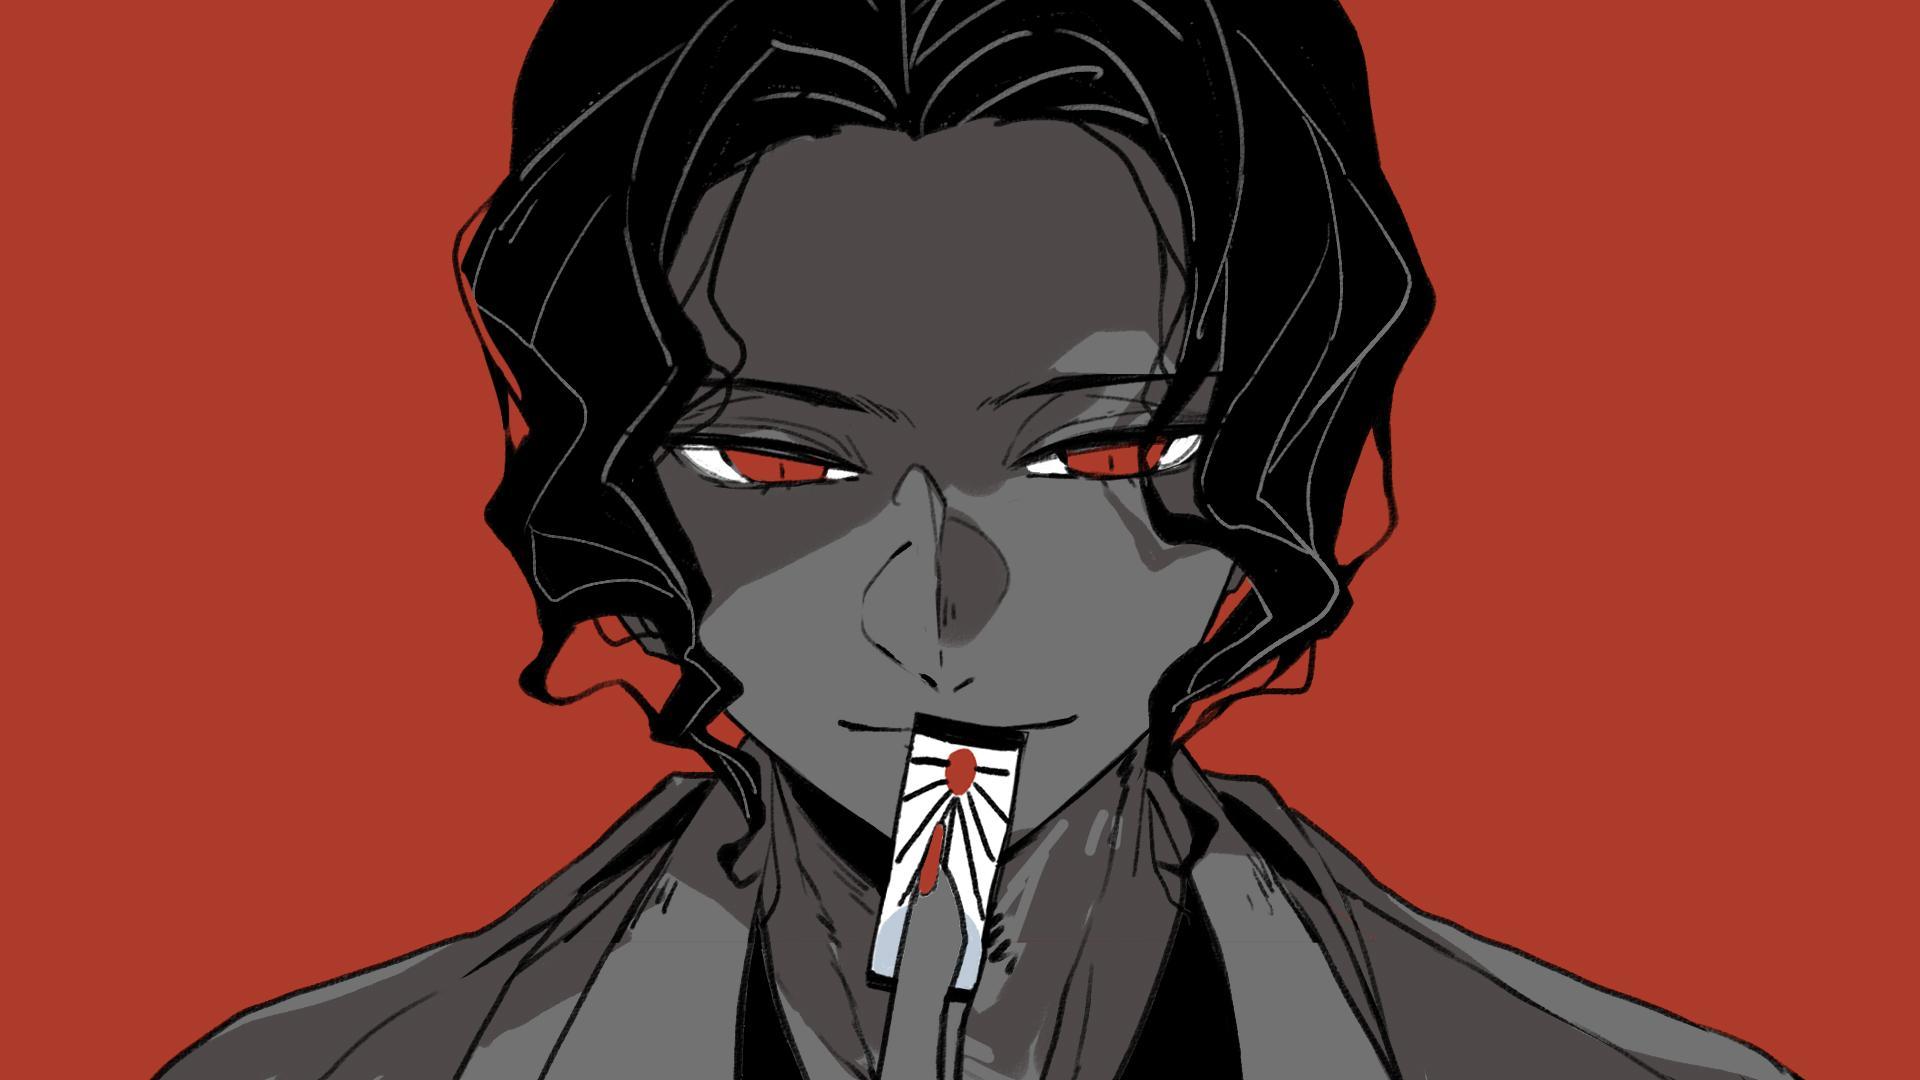 8 Fakta Menarik Kibutsuji Muzan, Raja Iblis di Kimetsu no Yaiba 3